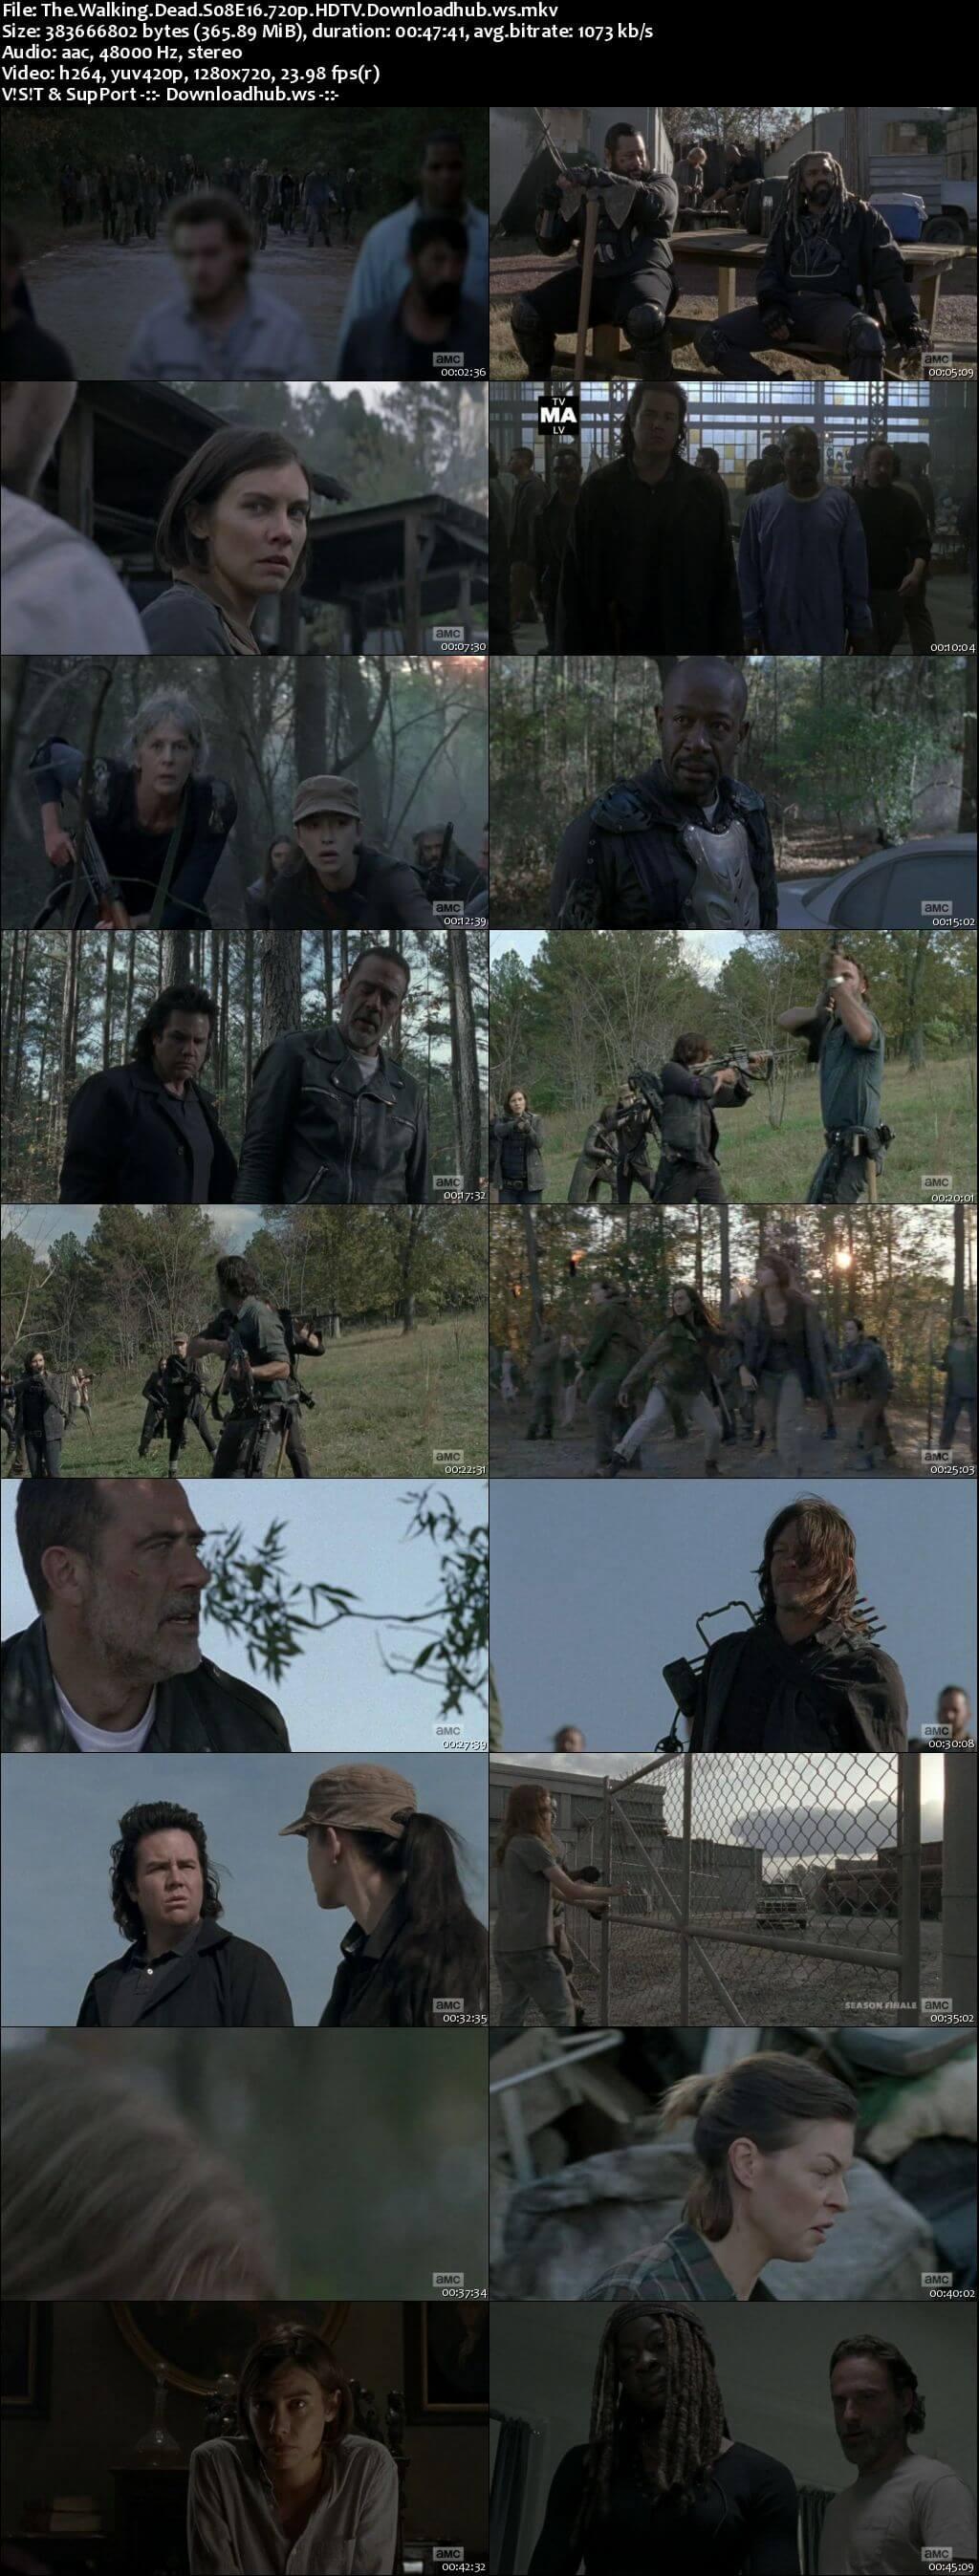 The Walking Dead S08E16 350MB HDTV 720p x264